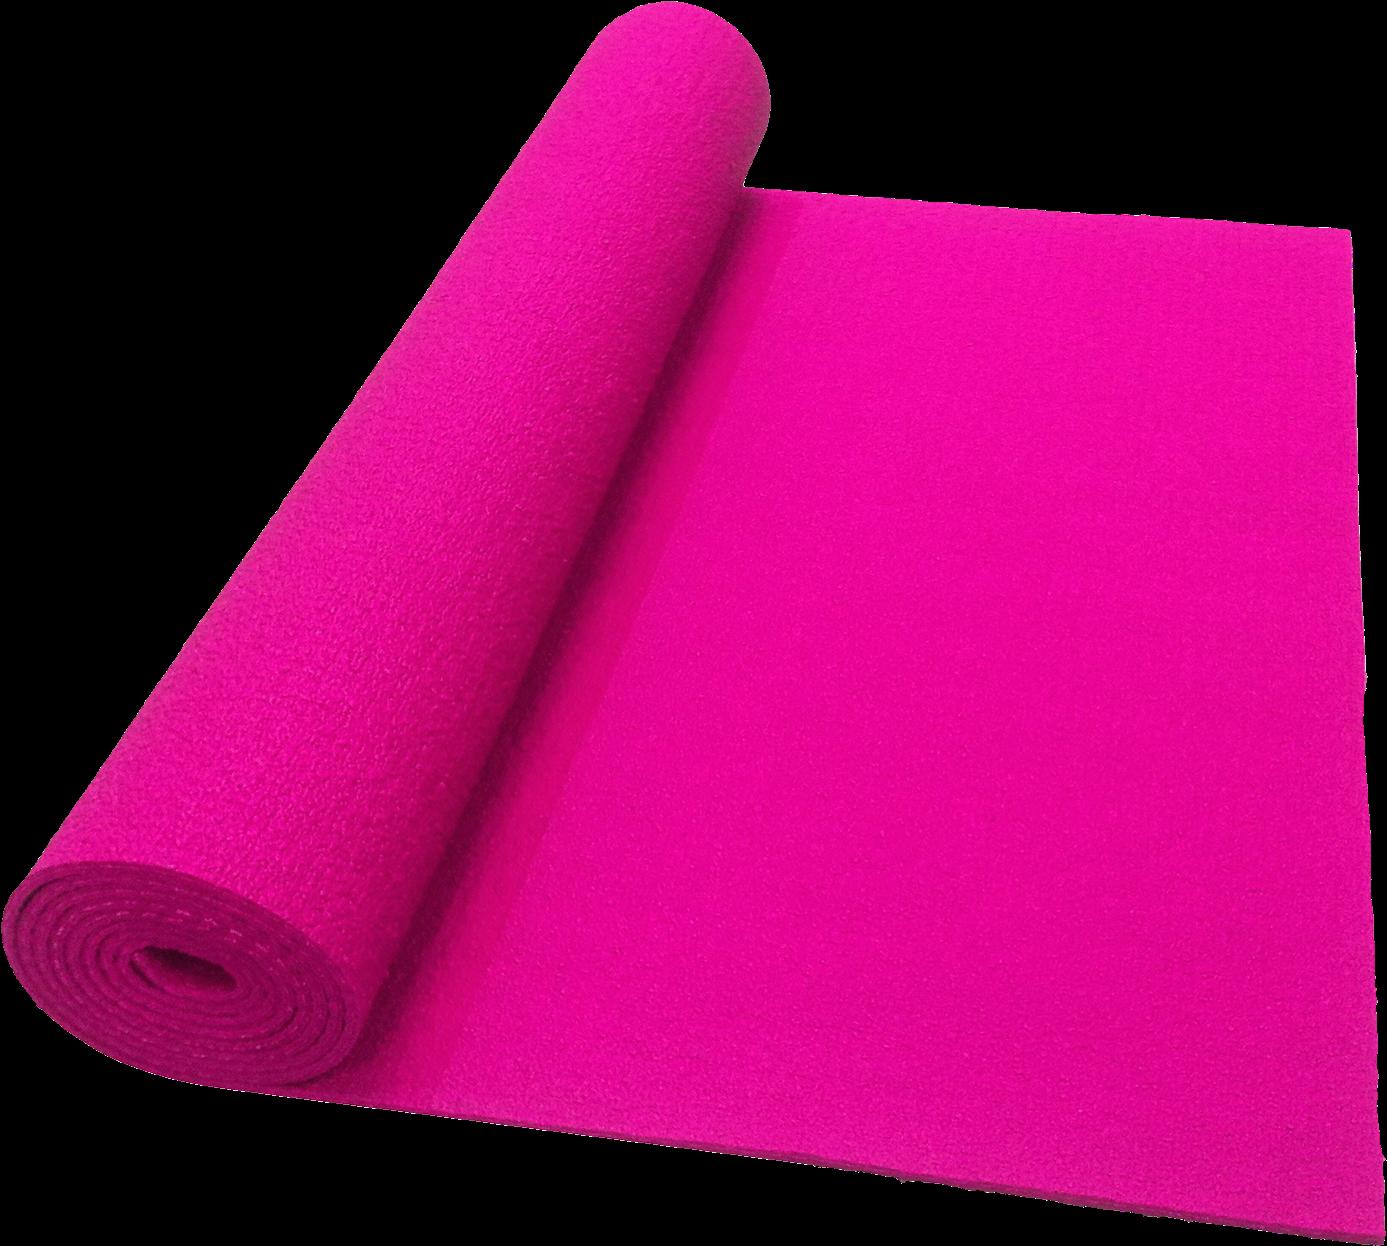 Yoga Mat Png Pluspng Pluspng Clipart Full Size Clipart 2908005 Pinclipart